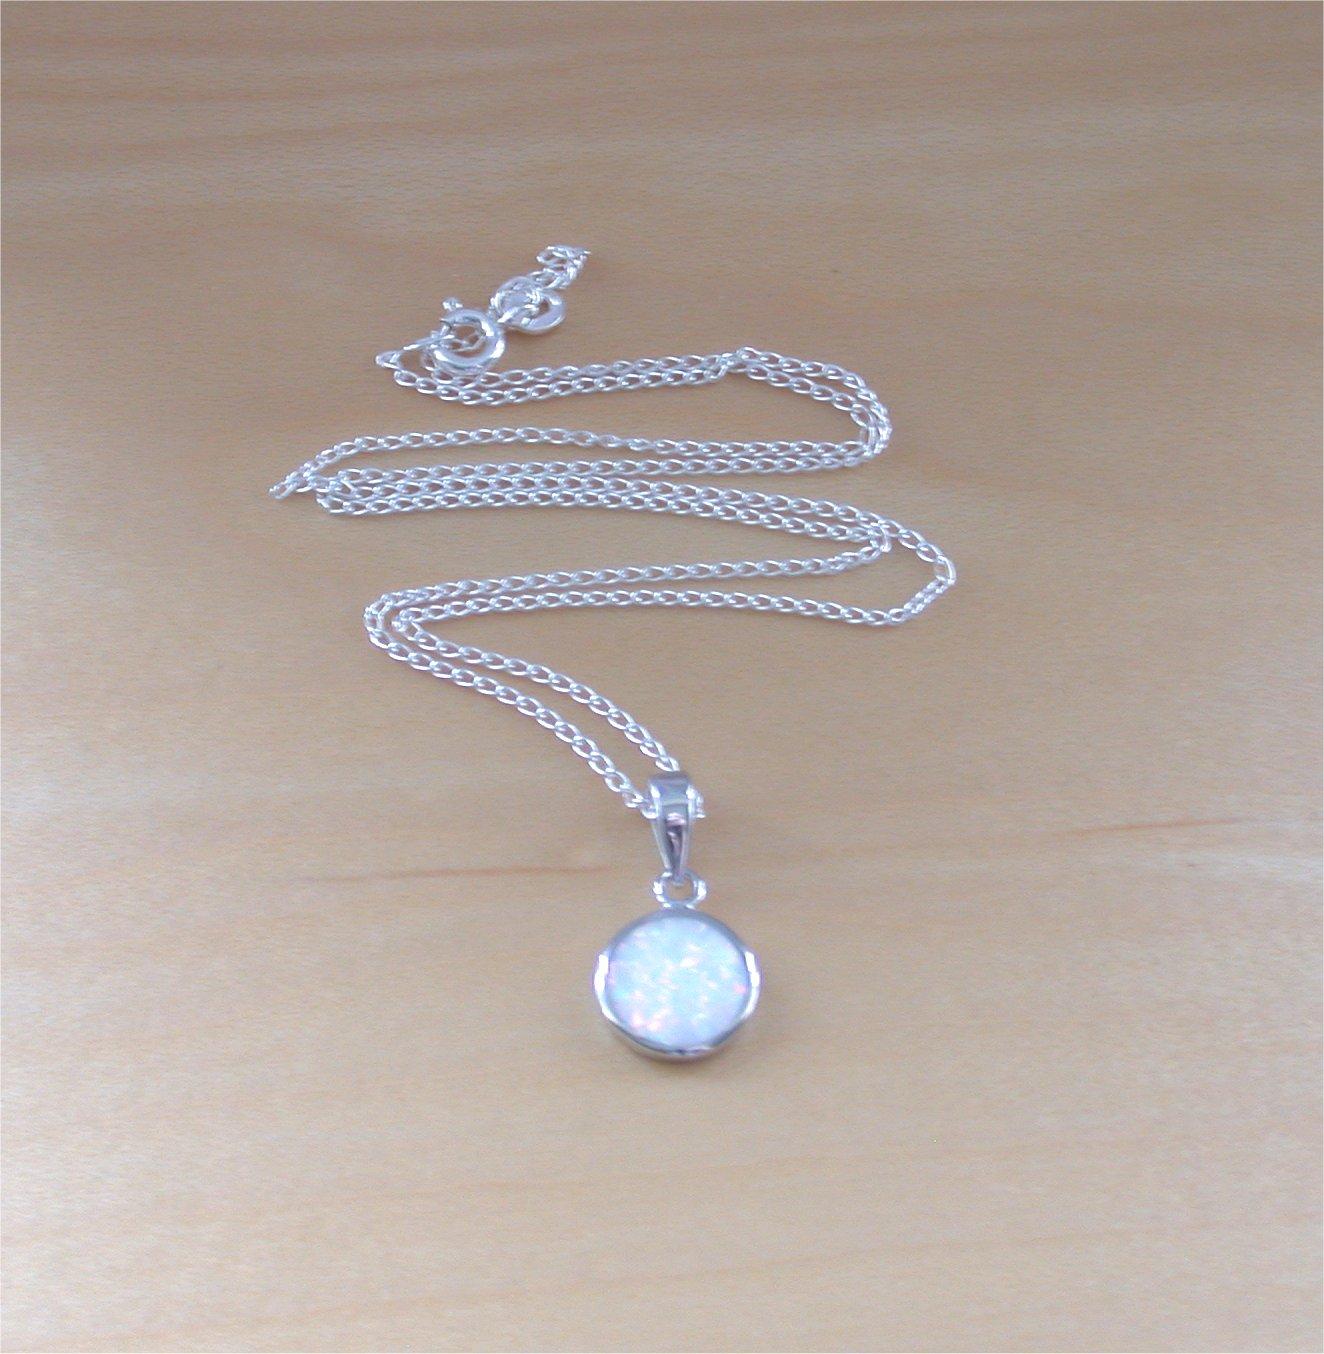 antique white product silver fischer necklace pendant scott kendra opal